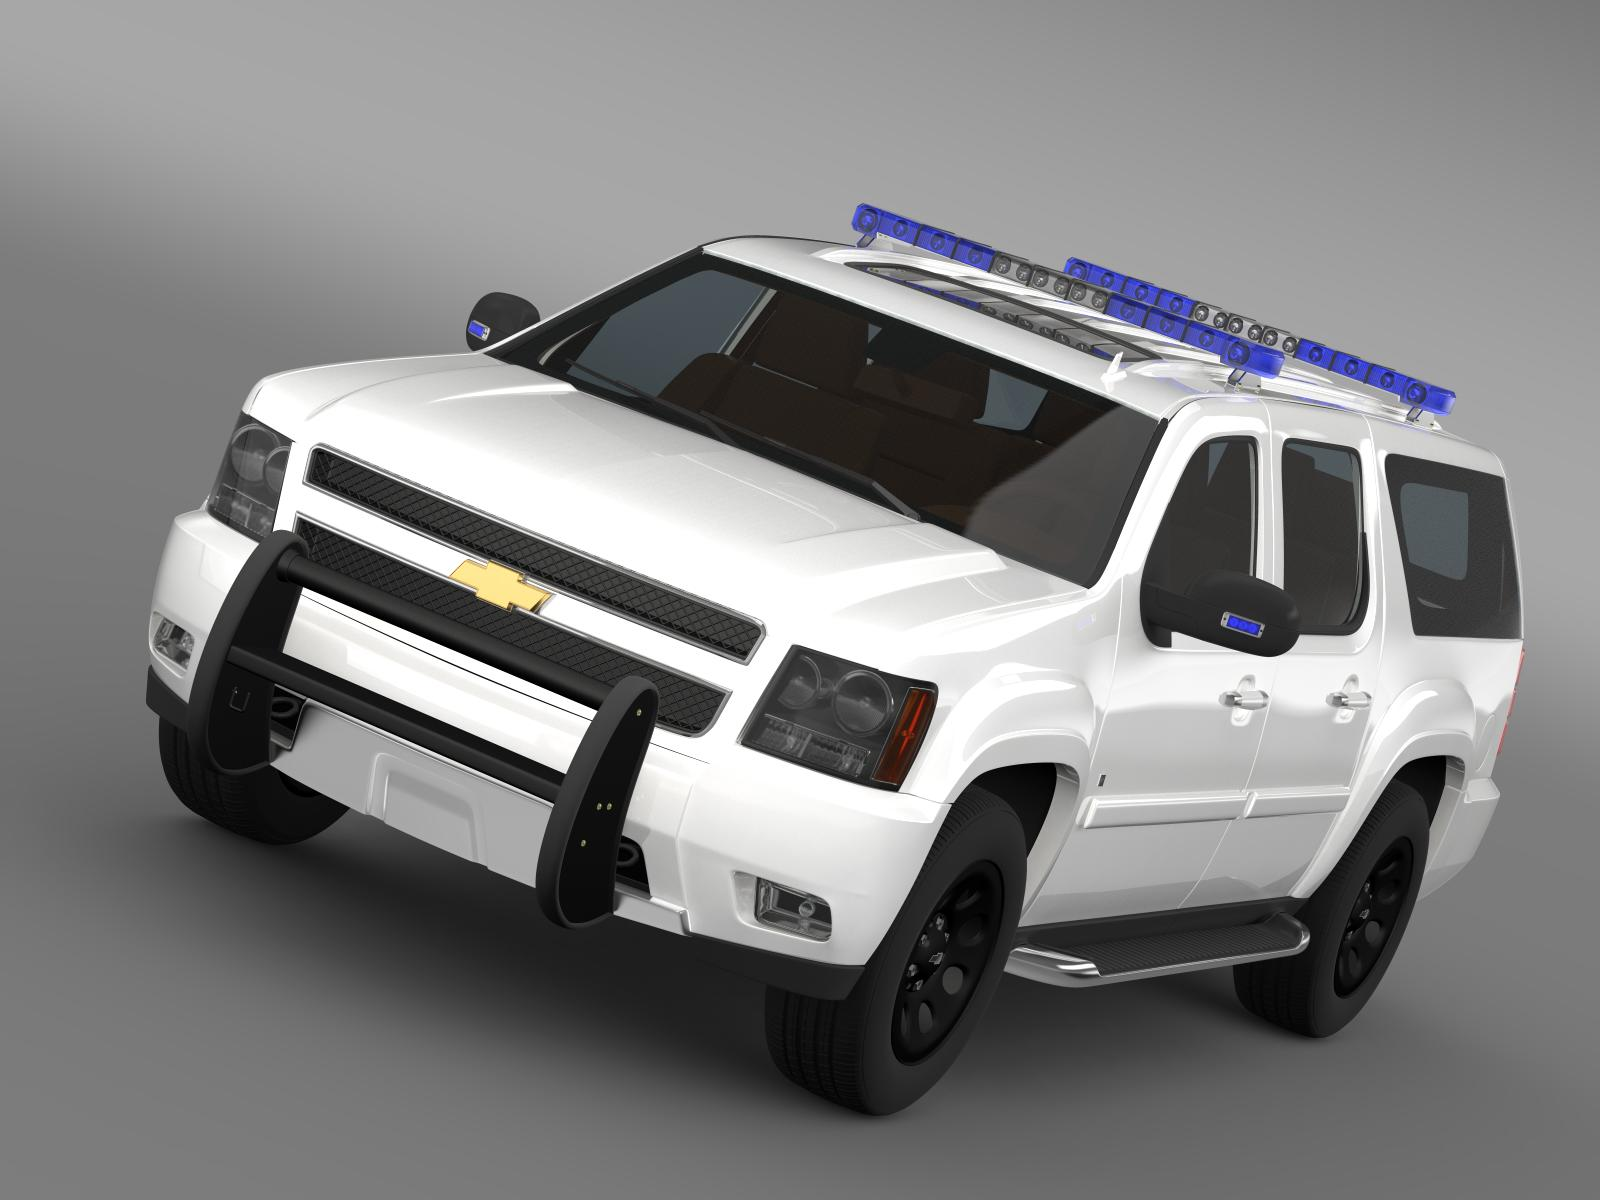 chevrolet suburban z71 police 3d model 3ds max fbx c4d lwo ma mb hrc xsi obj 203909